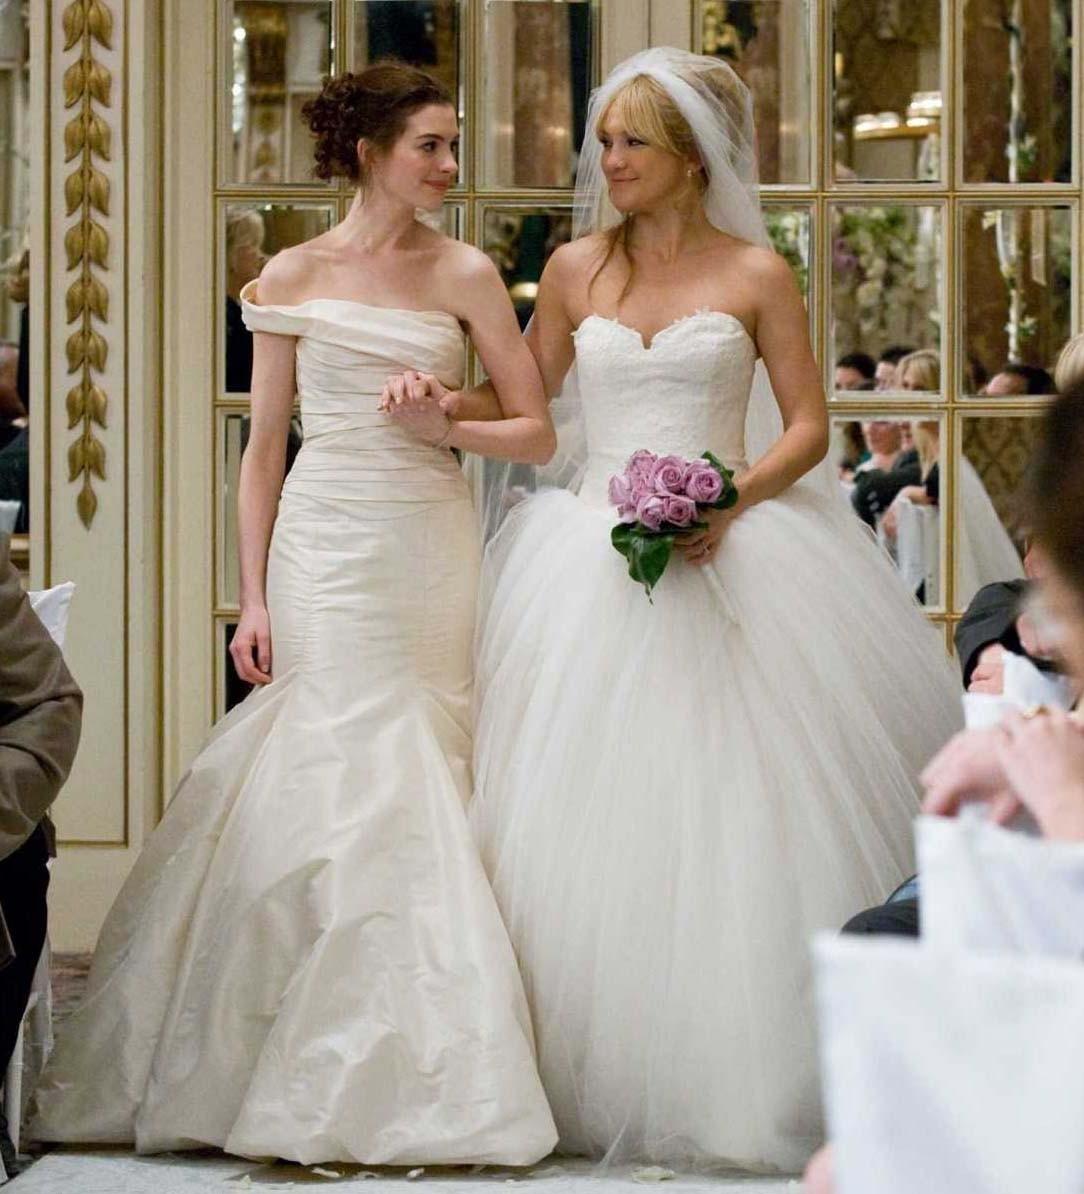 Anne Hathaway e Kate Hudson in Vera Wang nel film Bride Wars 2009